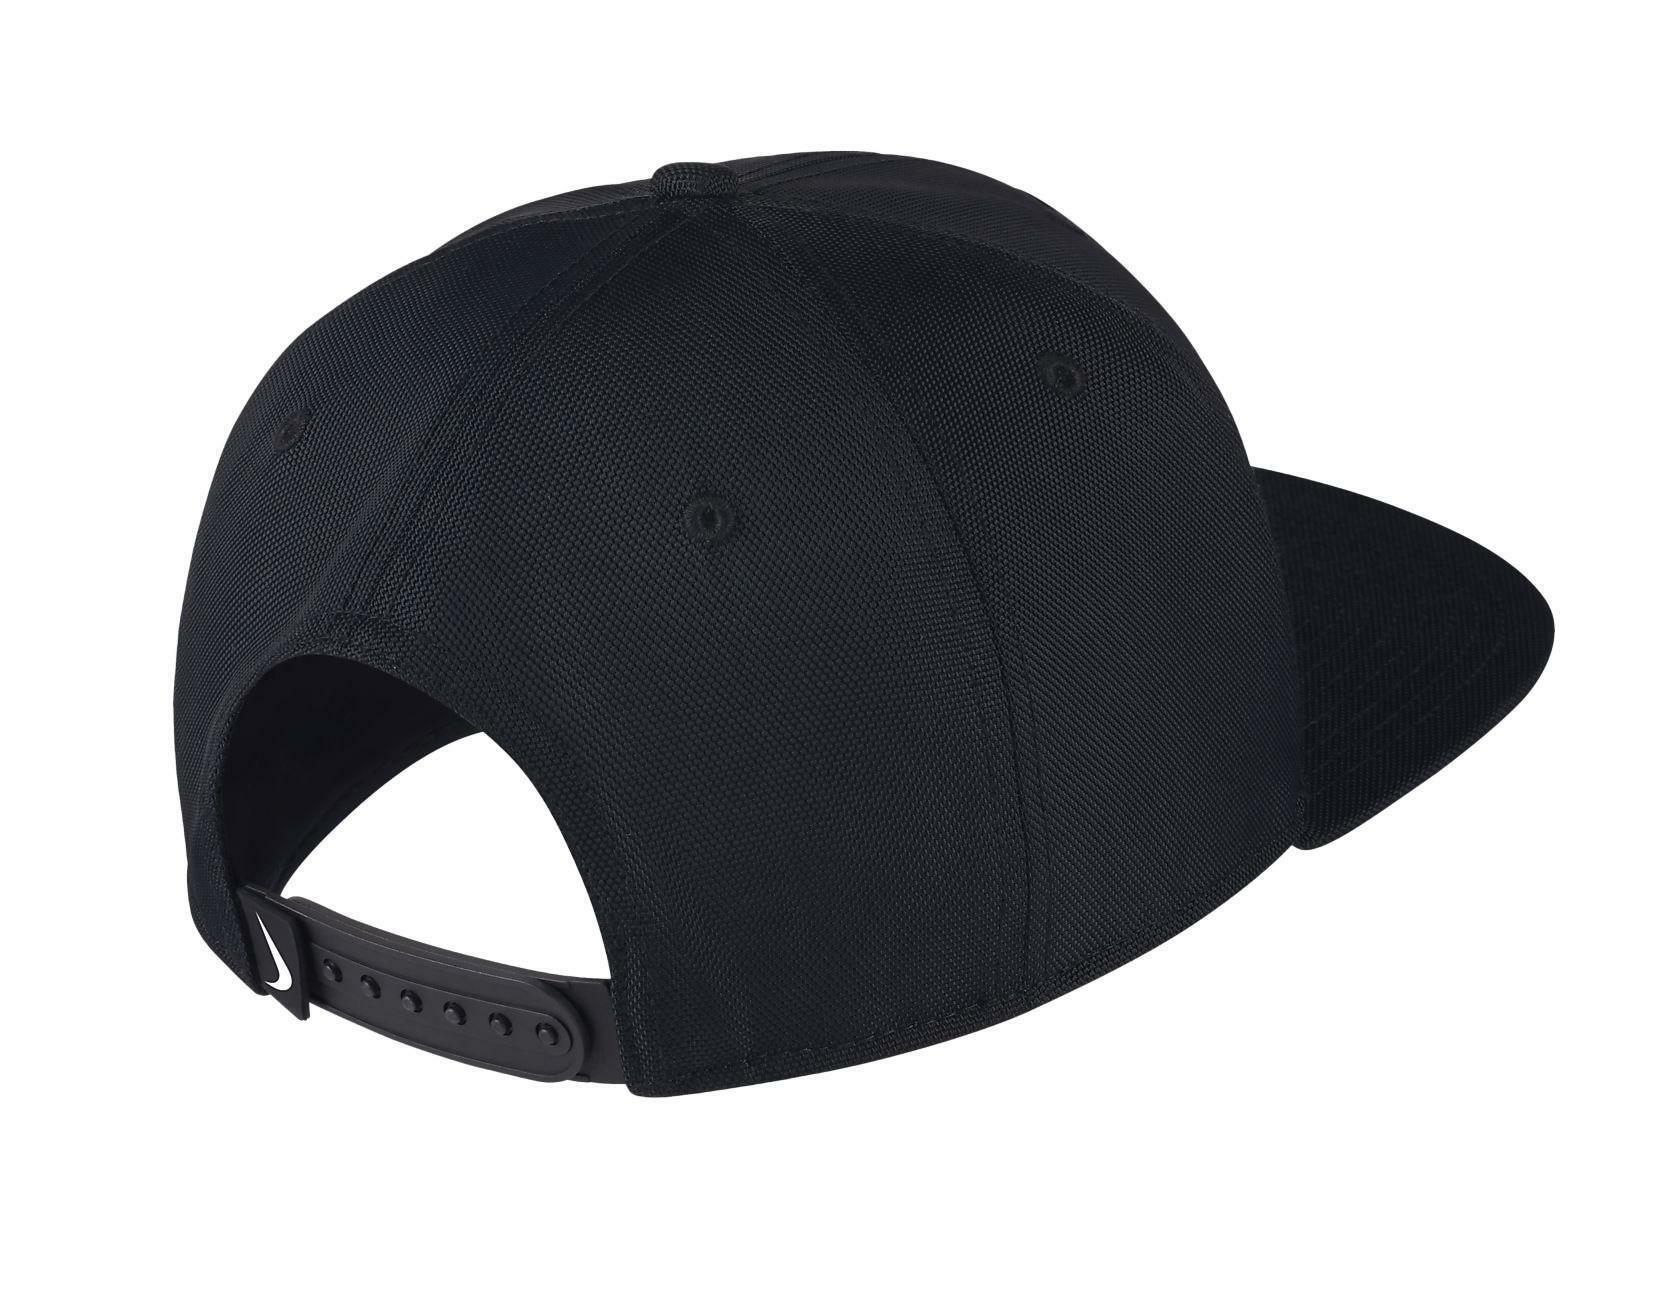 nike nike sportswear pro cappello nero